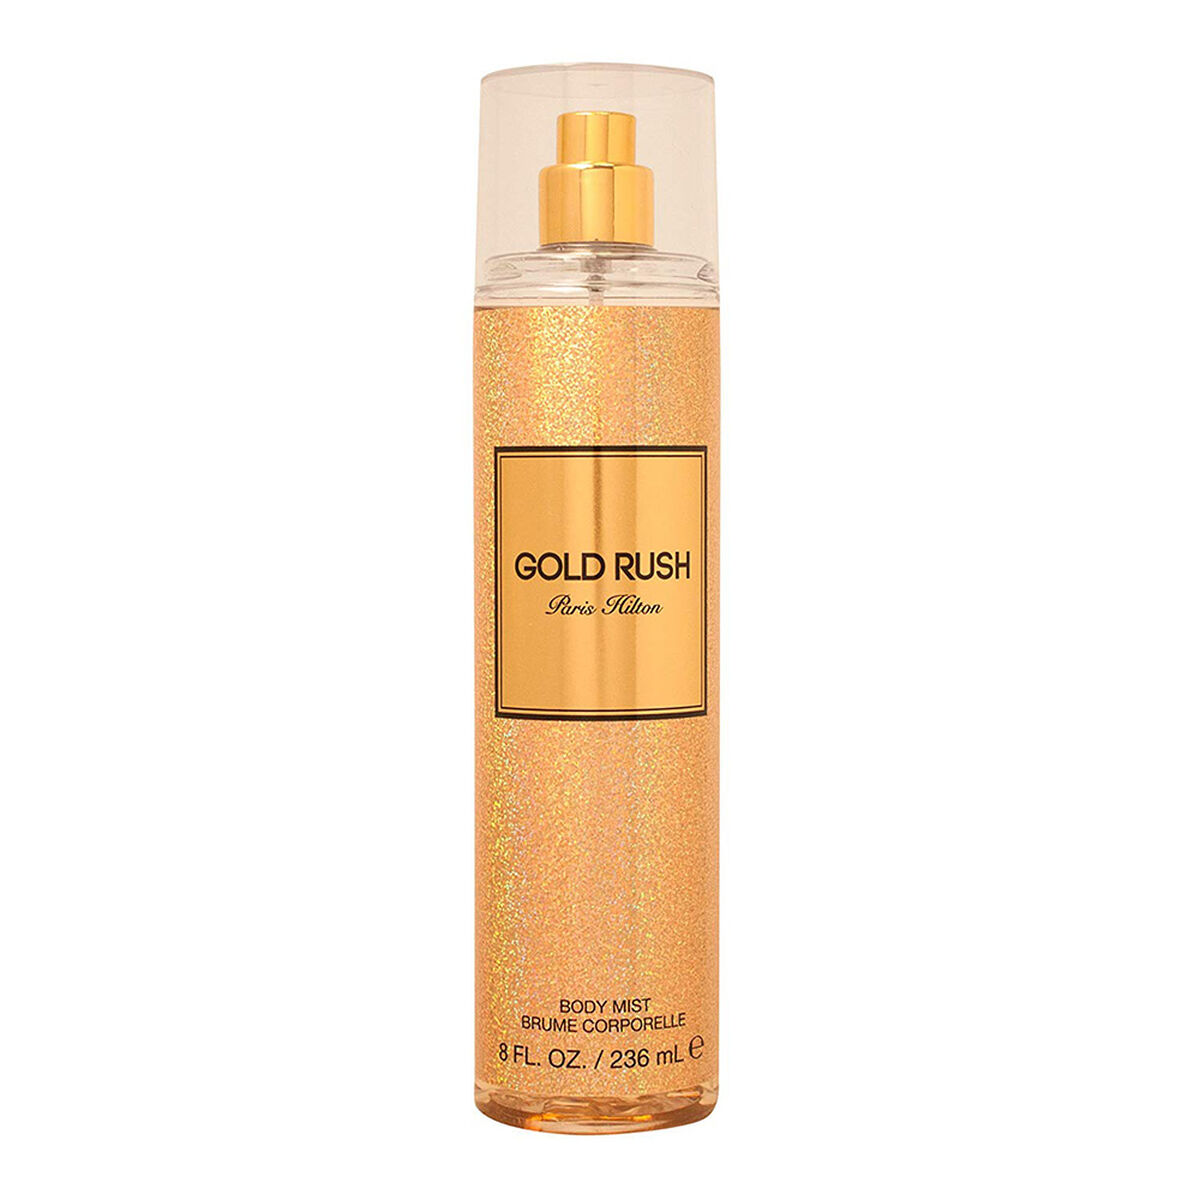 Body Mist Gold Rush Paris Hilton 236 ml